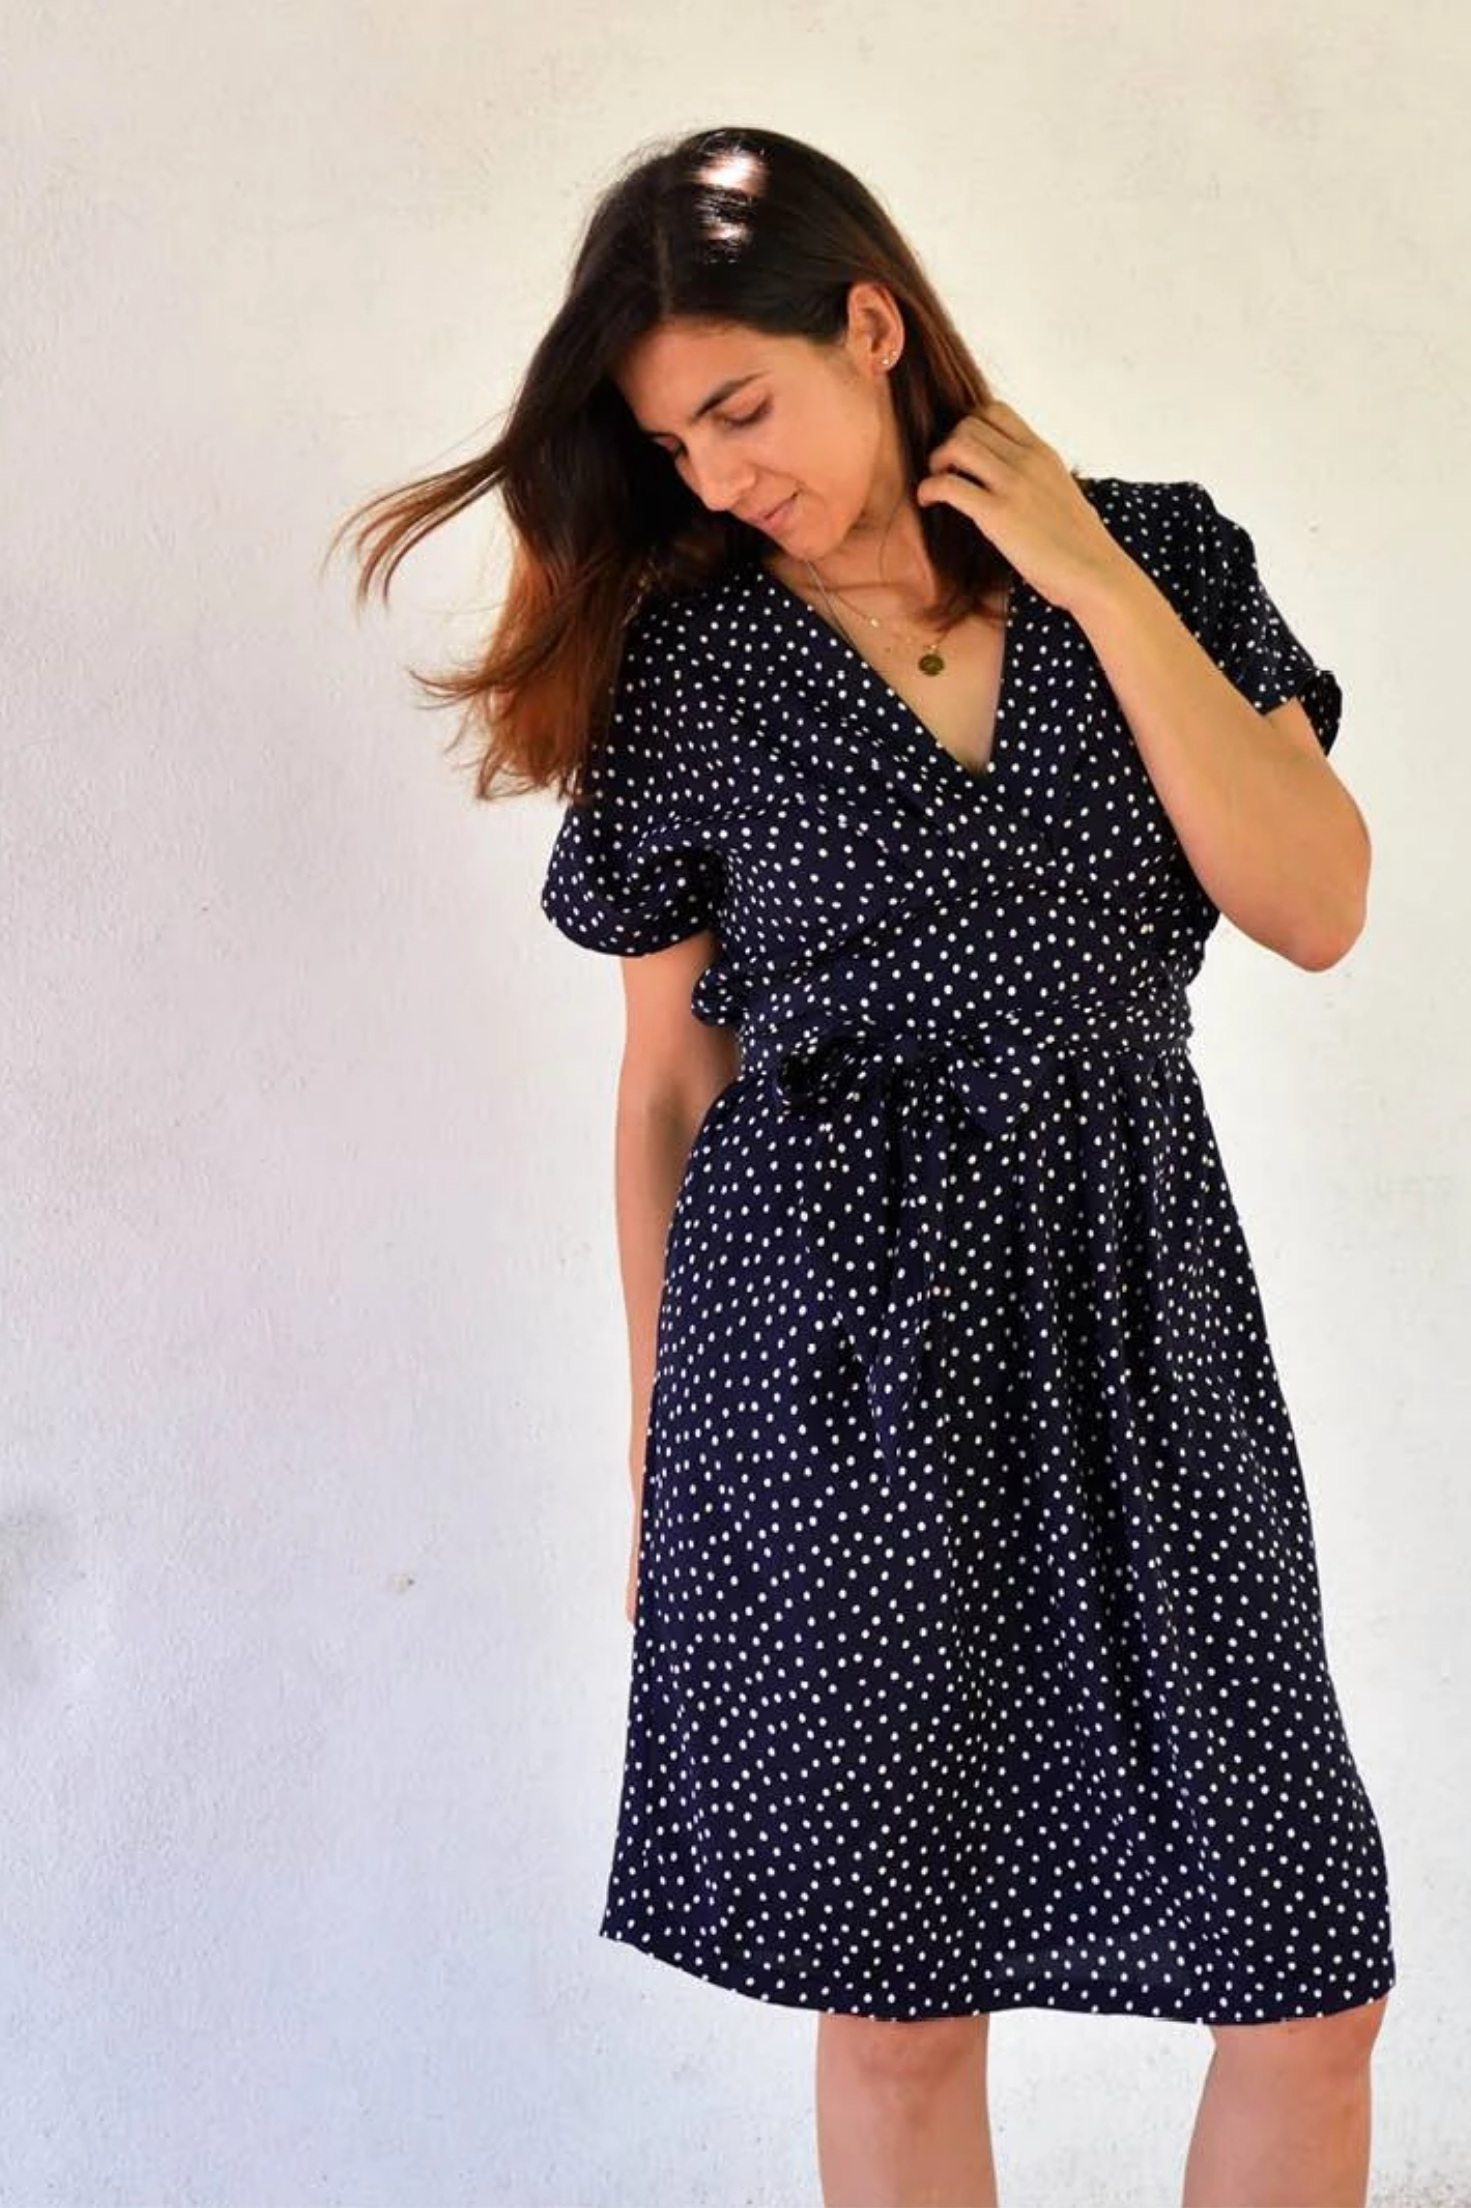 Akinori Wrap Dress from Wardrobe By Me